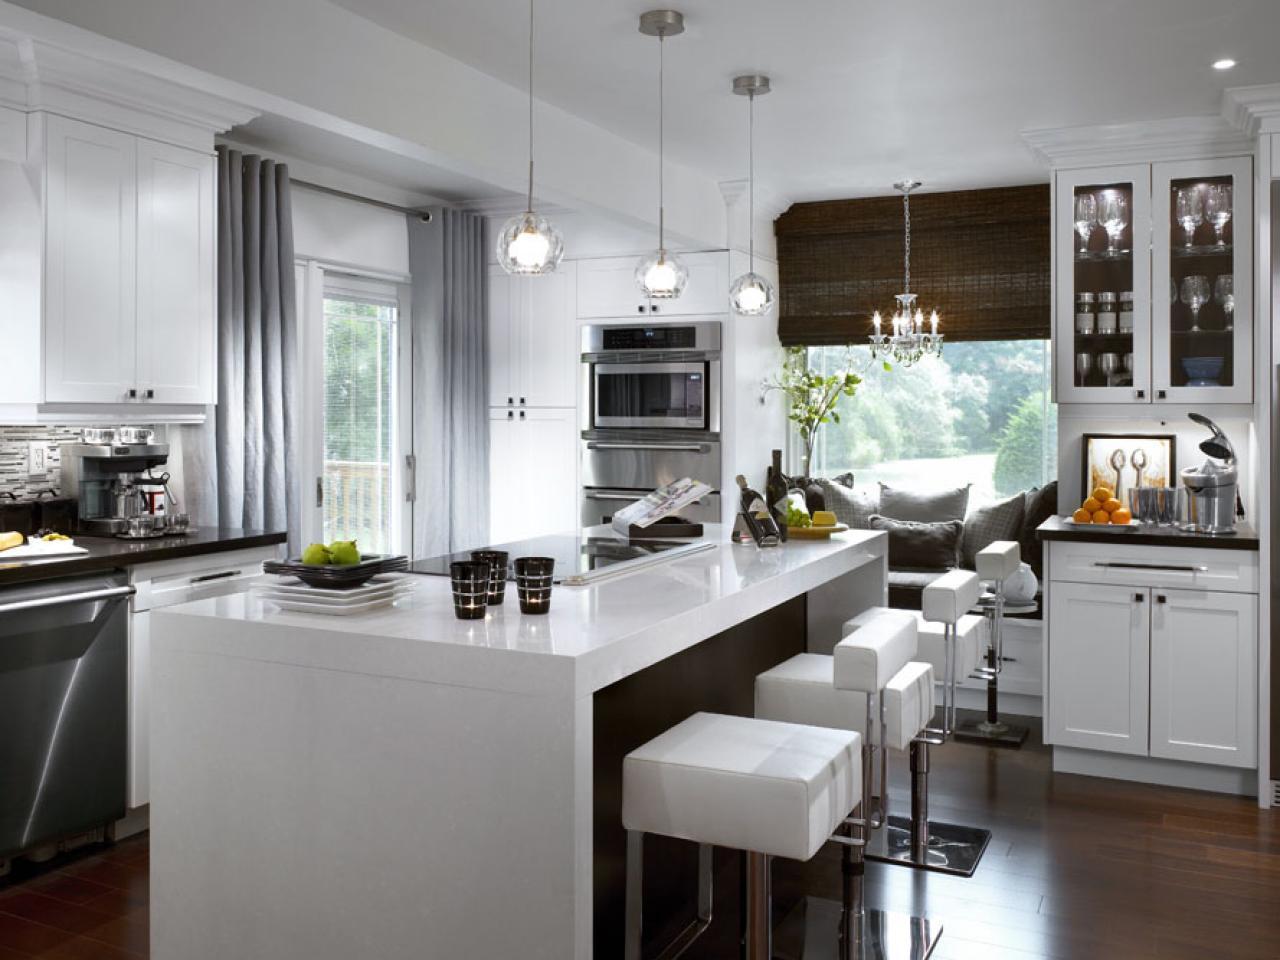 candice-olson-kitchen-design-pictures-photo-13